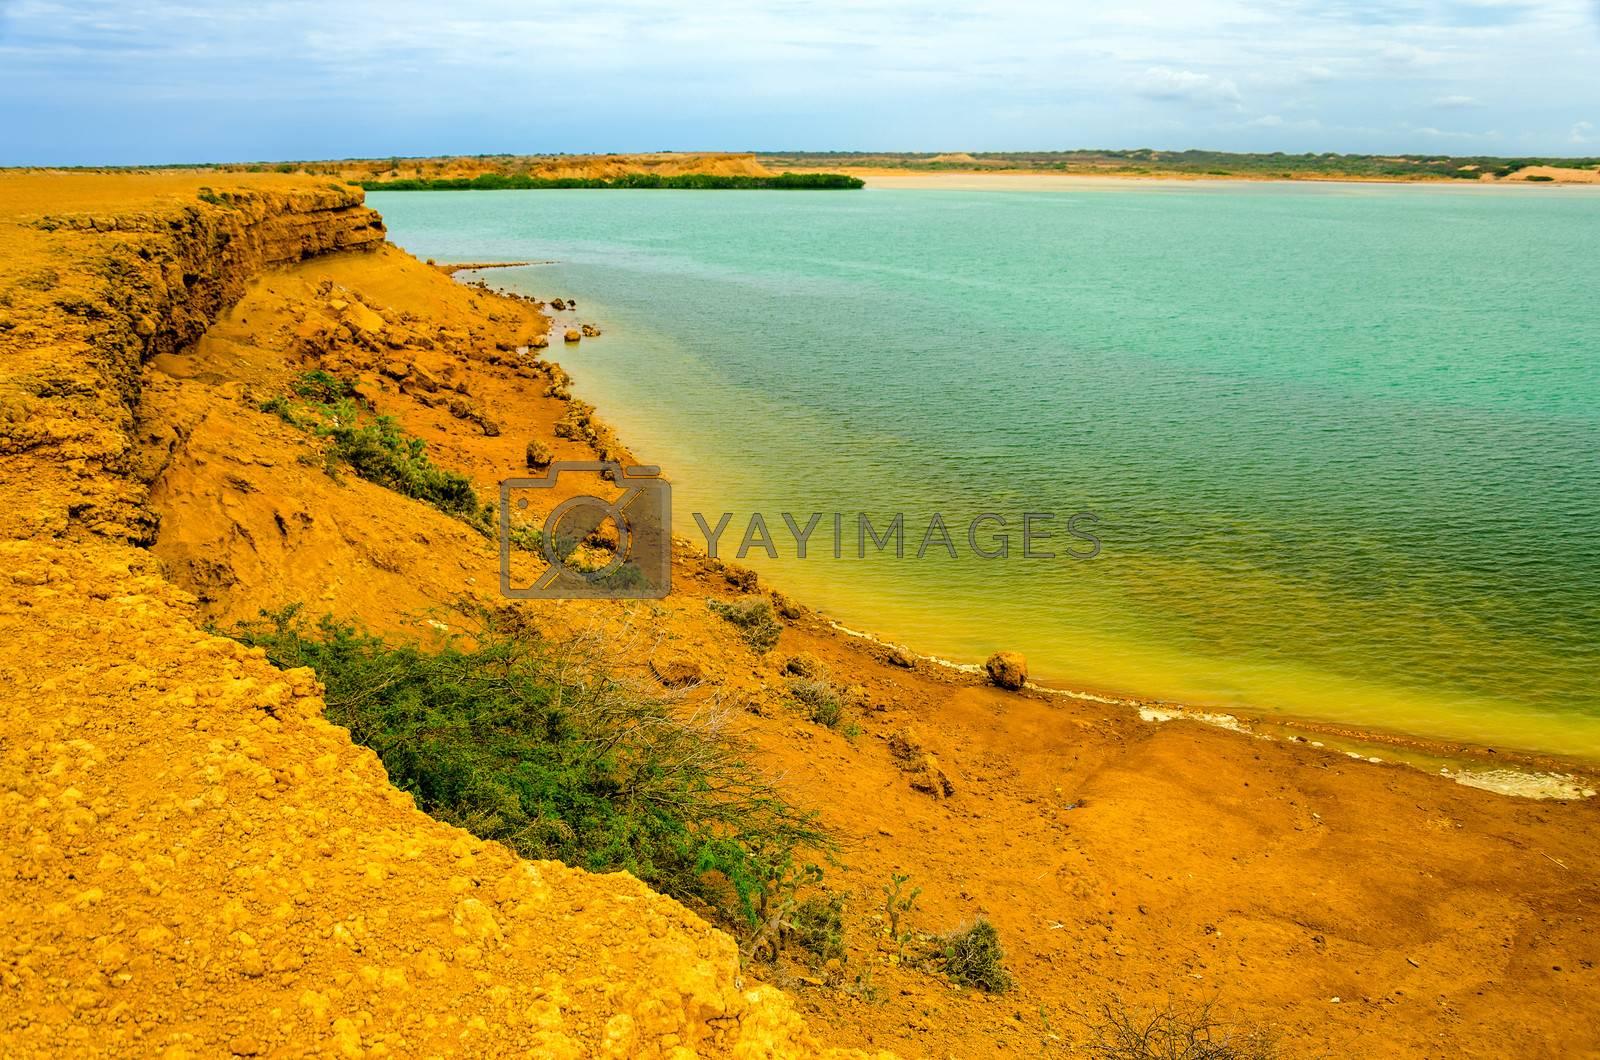 View of Honda Bay as seen from Punta Gallinas in La Guajira, Colombia